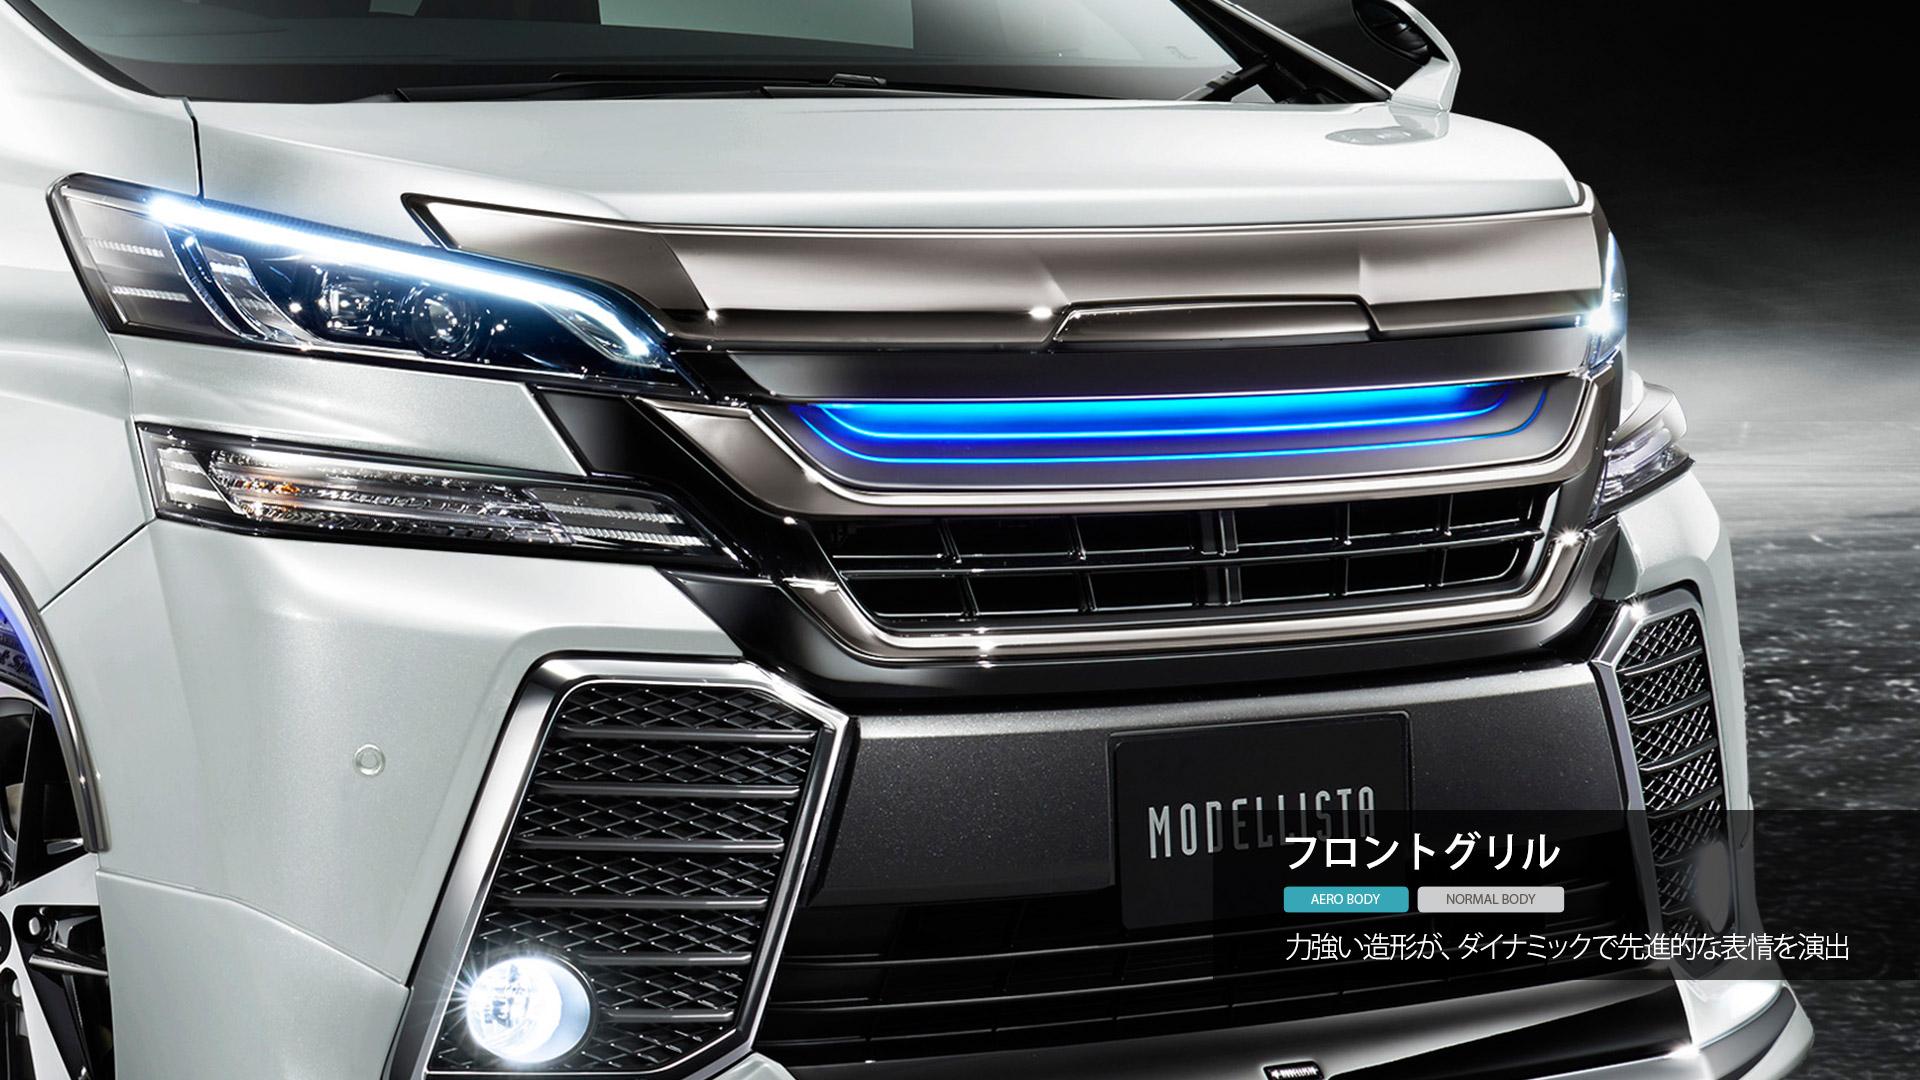 2016 Toyota Alphard, Vellfire get Modellista body kits